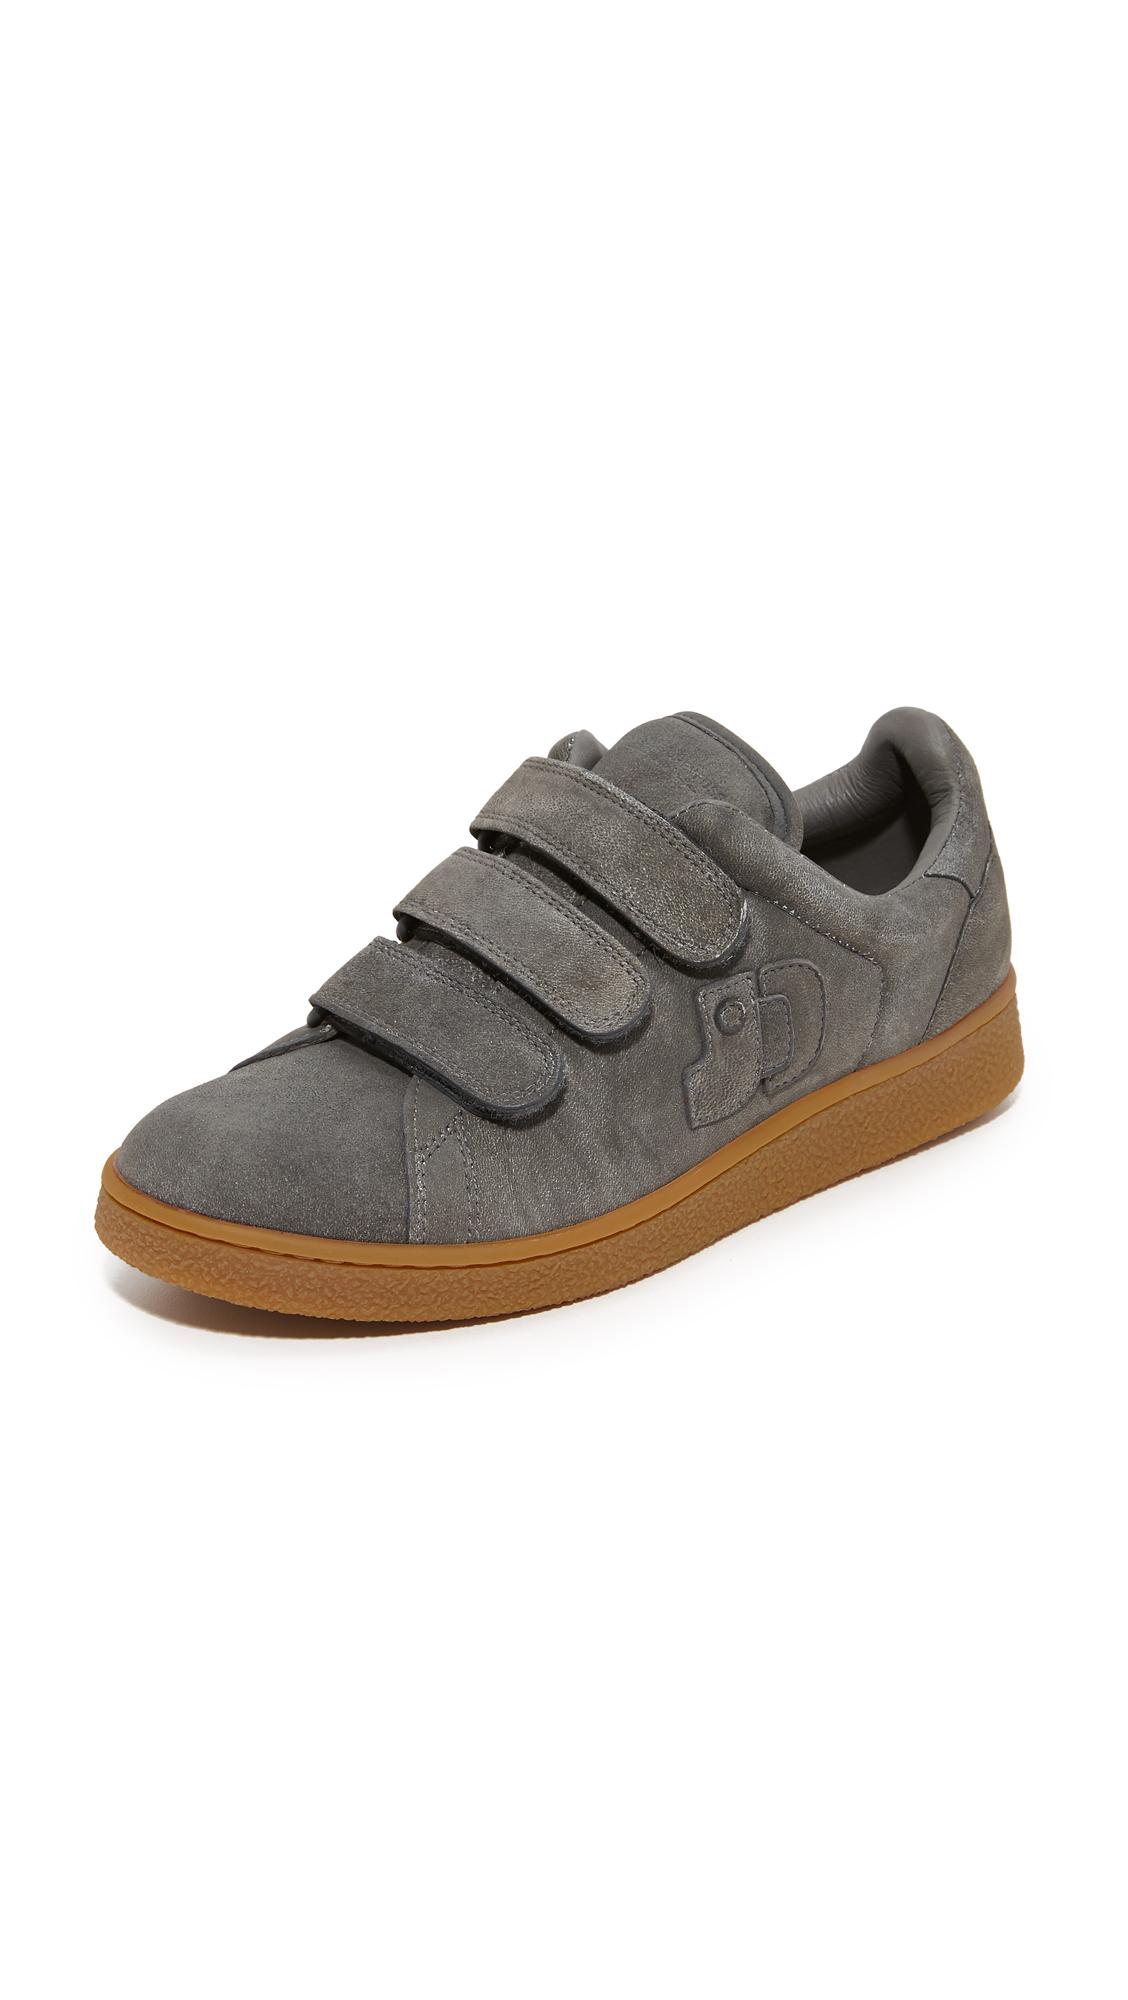 Jerome Dreyfuss Run Velcro Sneakers - Ardoise